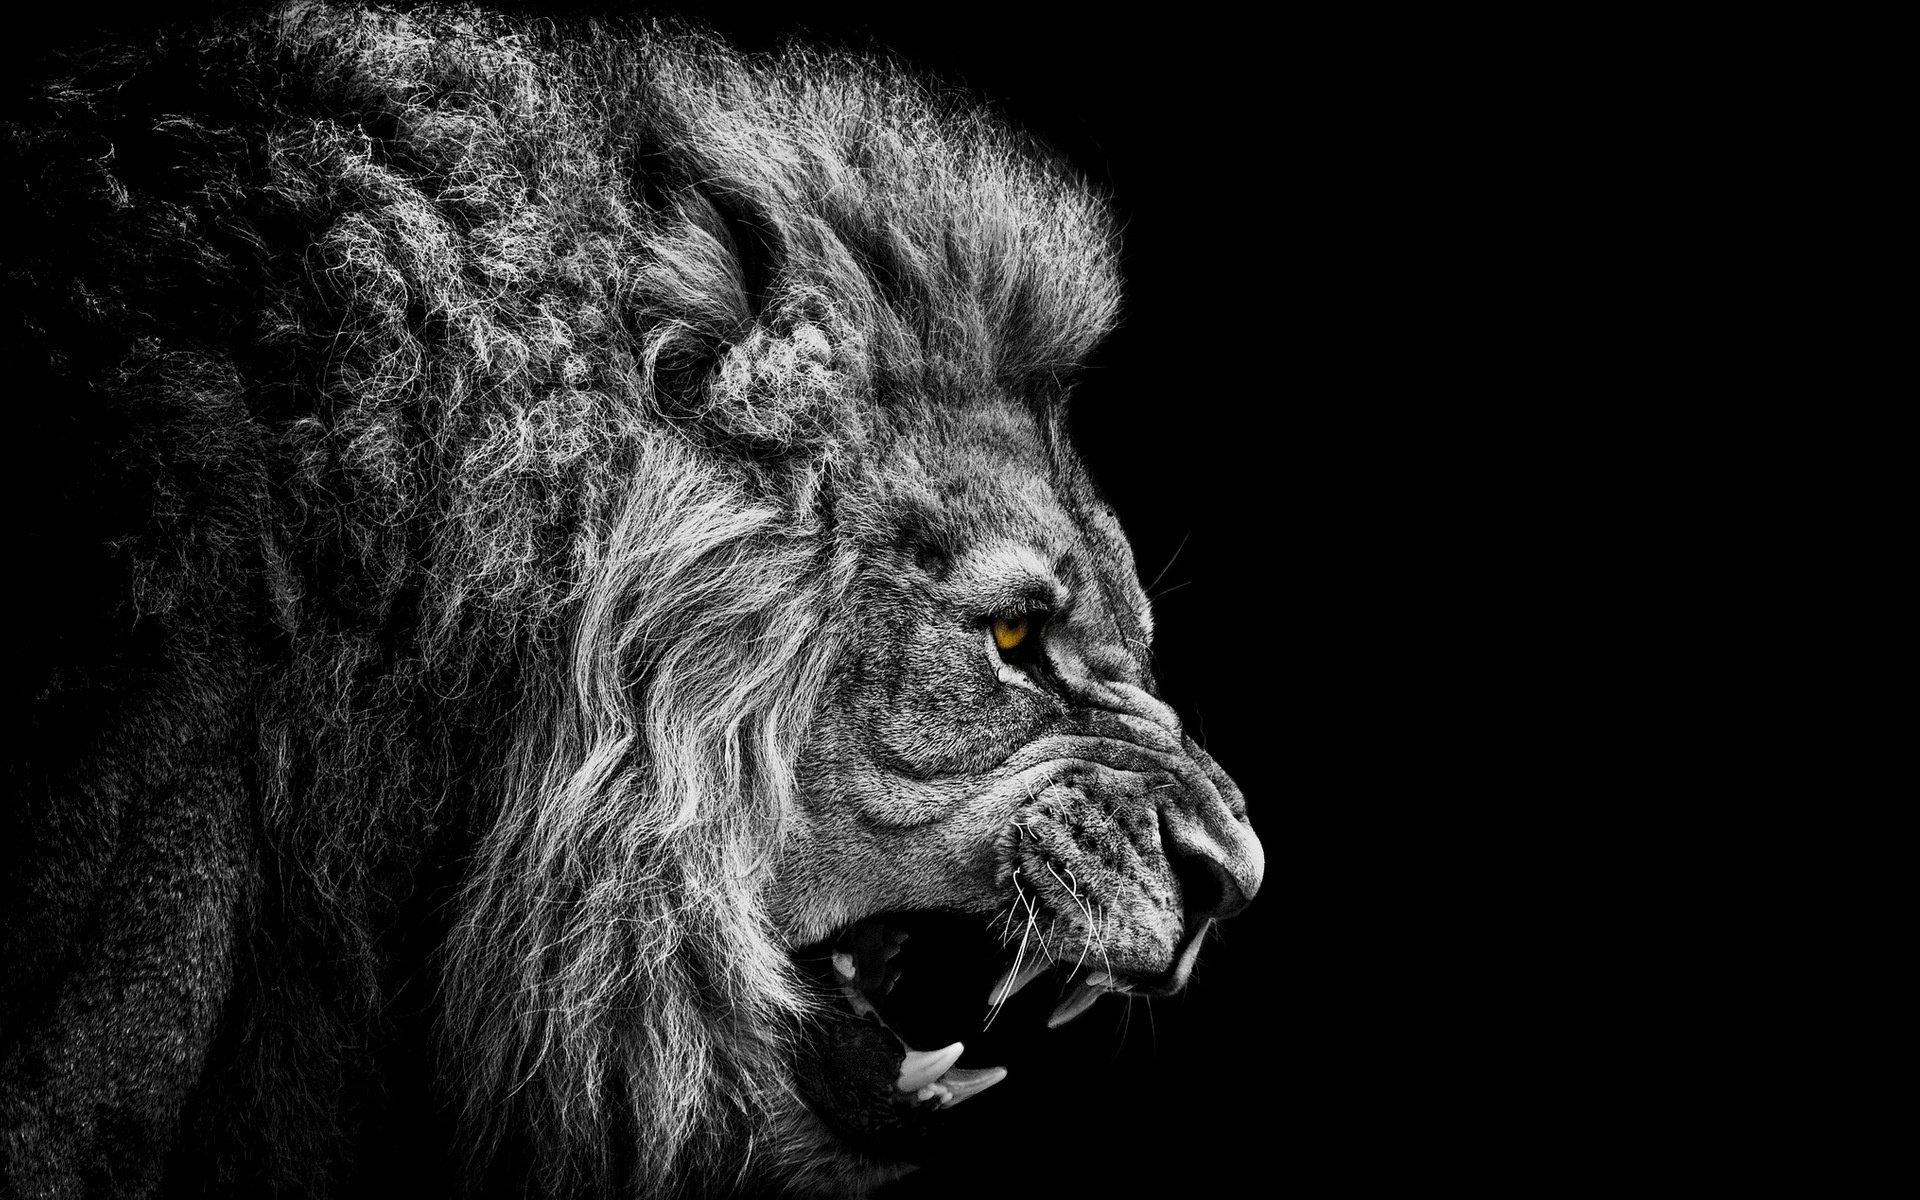 Fantastic Wallpaper Lion Facebook - thumb-1920-282184  You Should Have_94489.jpg